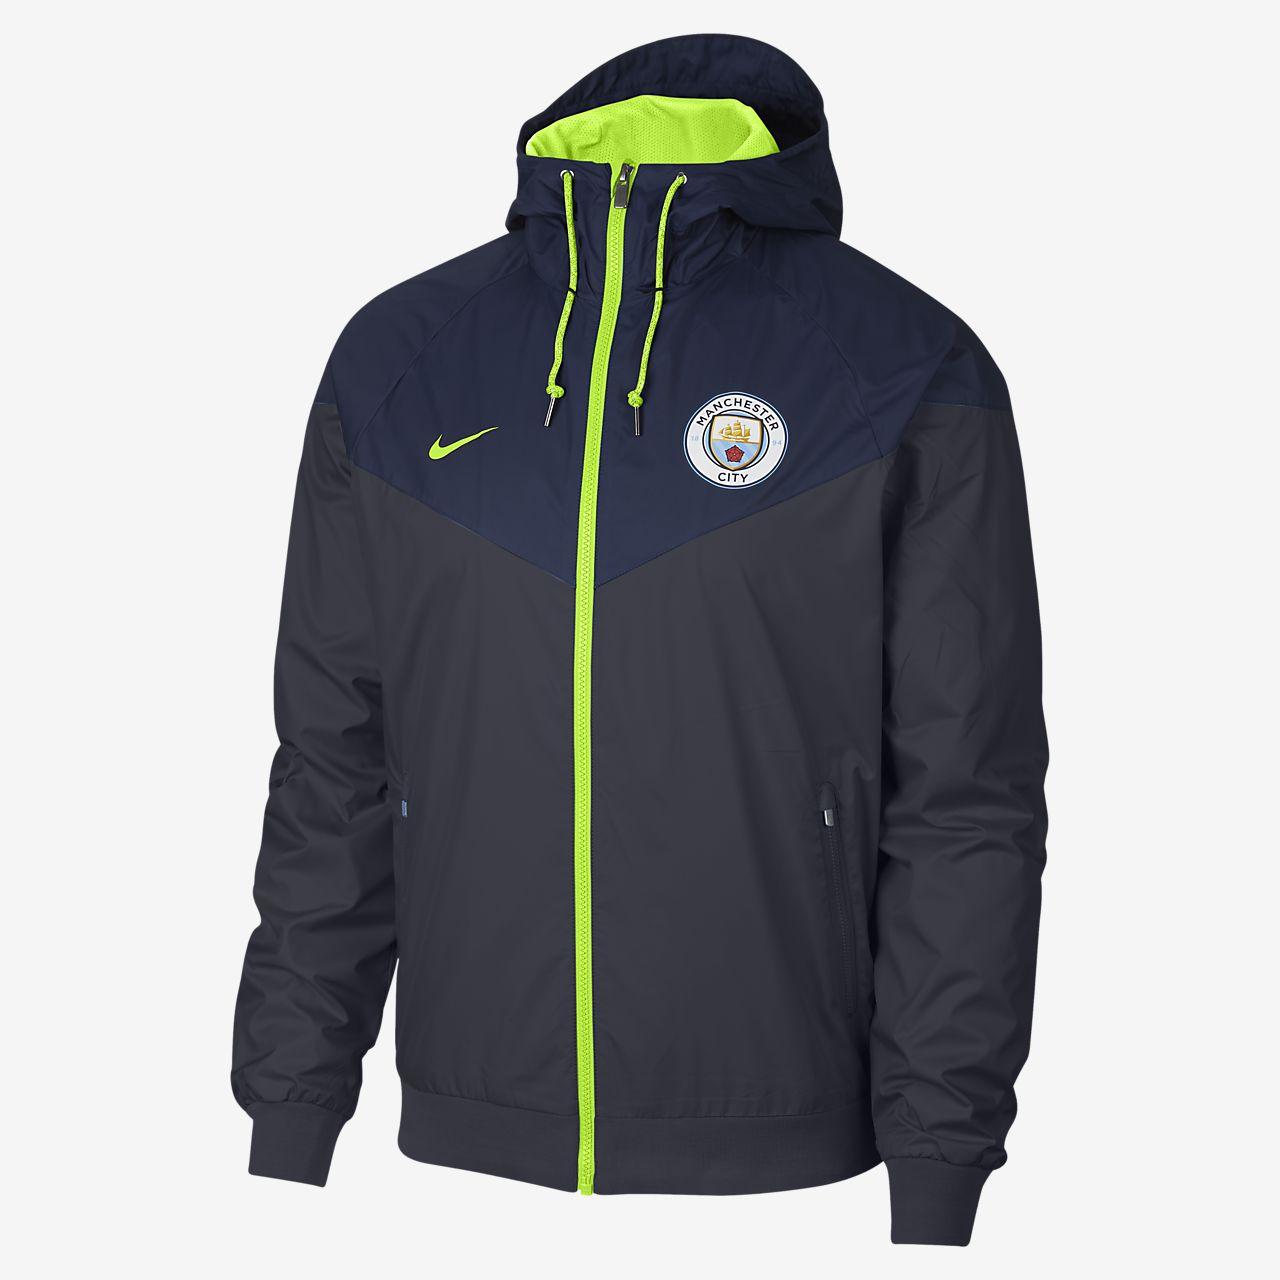 premium selection 69f27 52289 Manchester City FC Windrunner